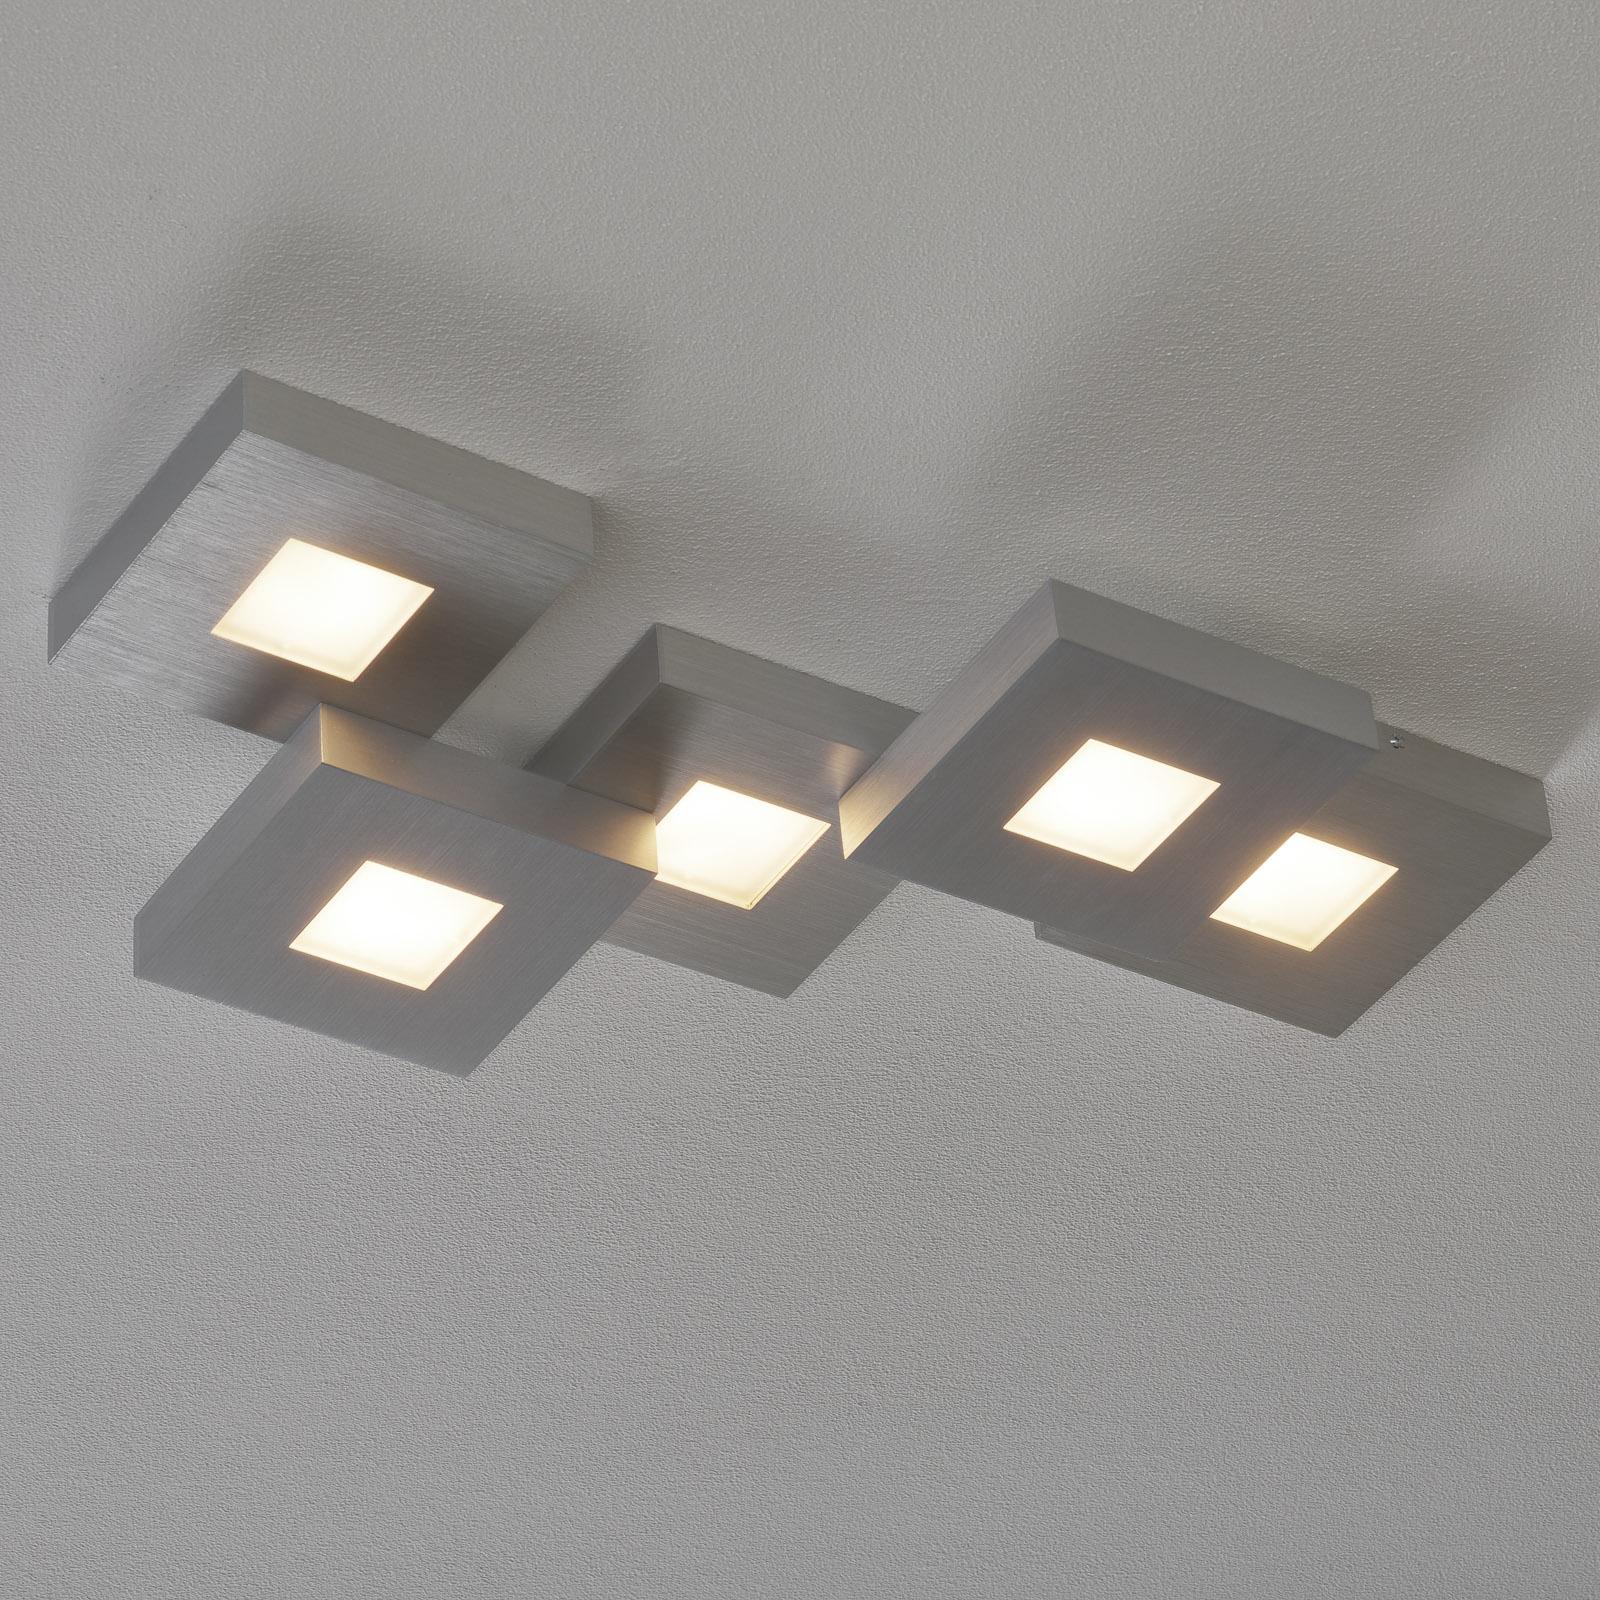 Stravagante plafoniera LED Cubus